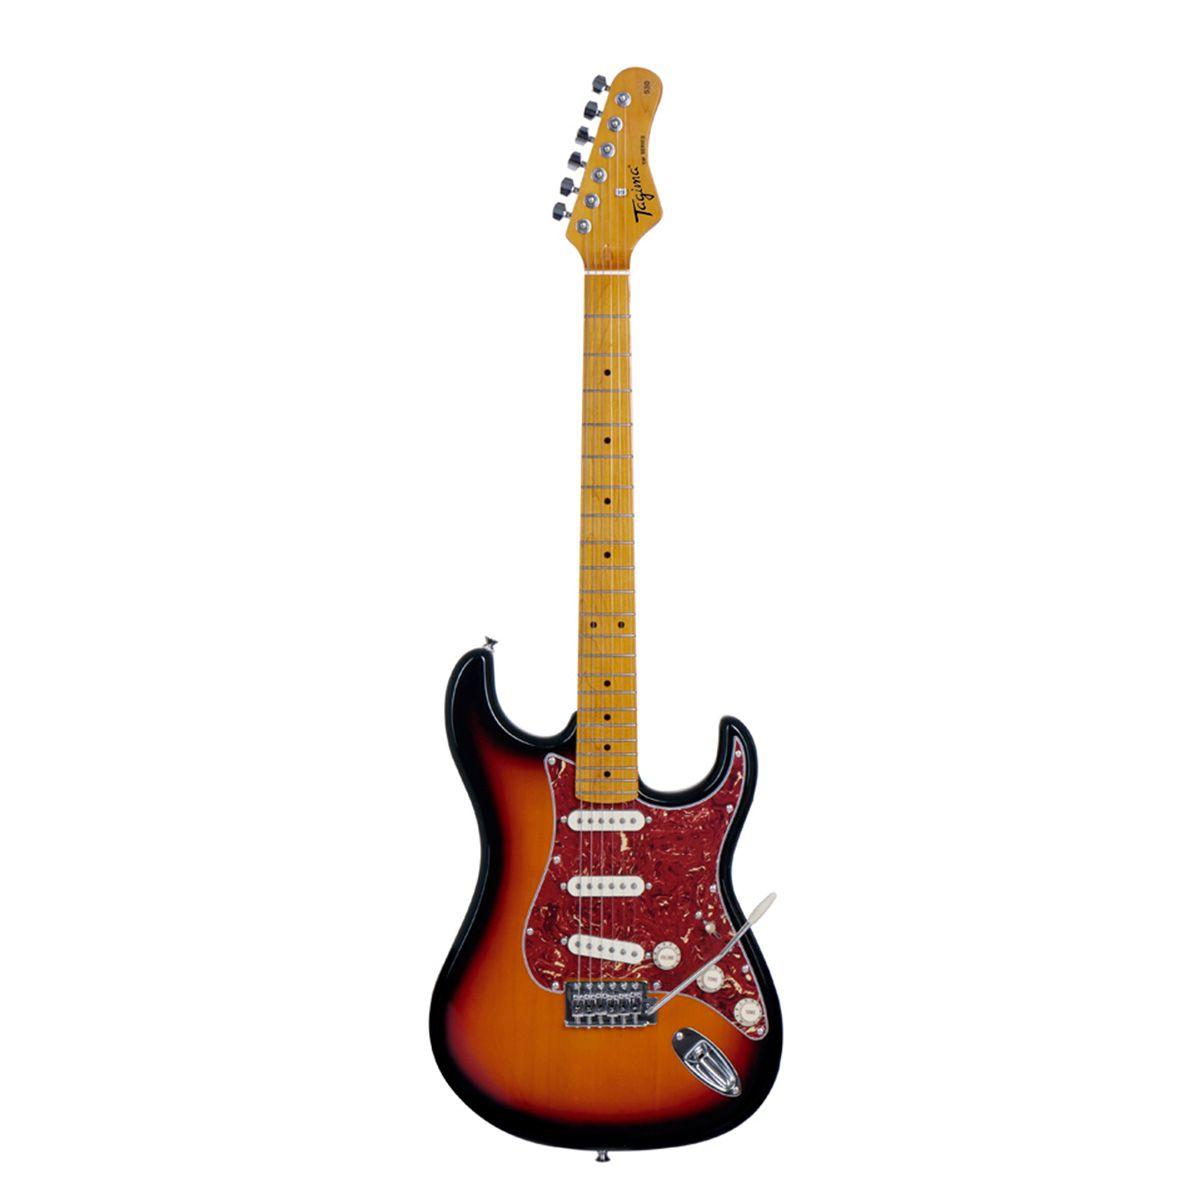 Guitarra Tagima TG 530 Woodstock Séries Sunburst